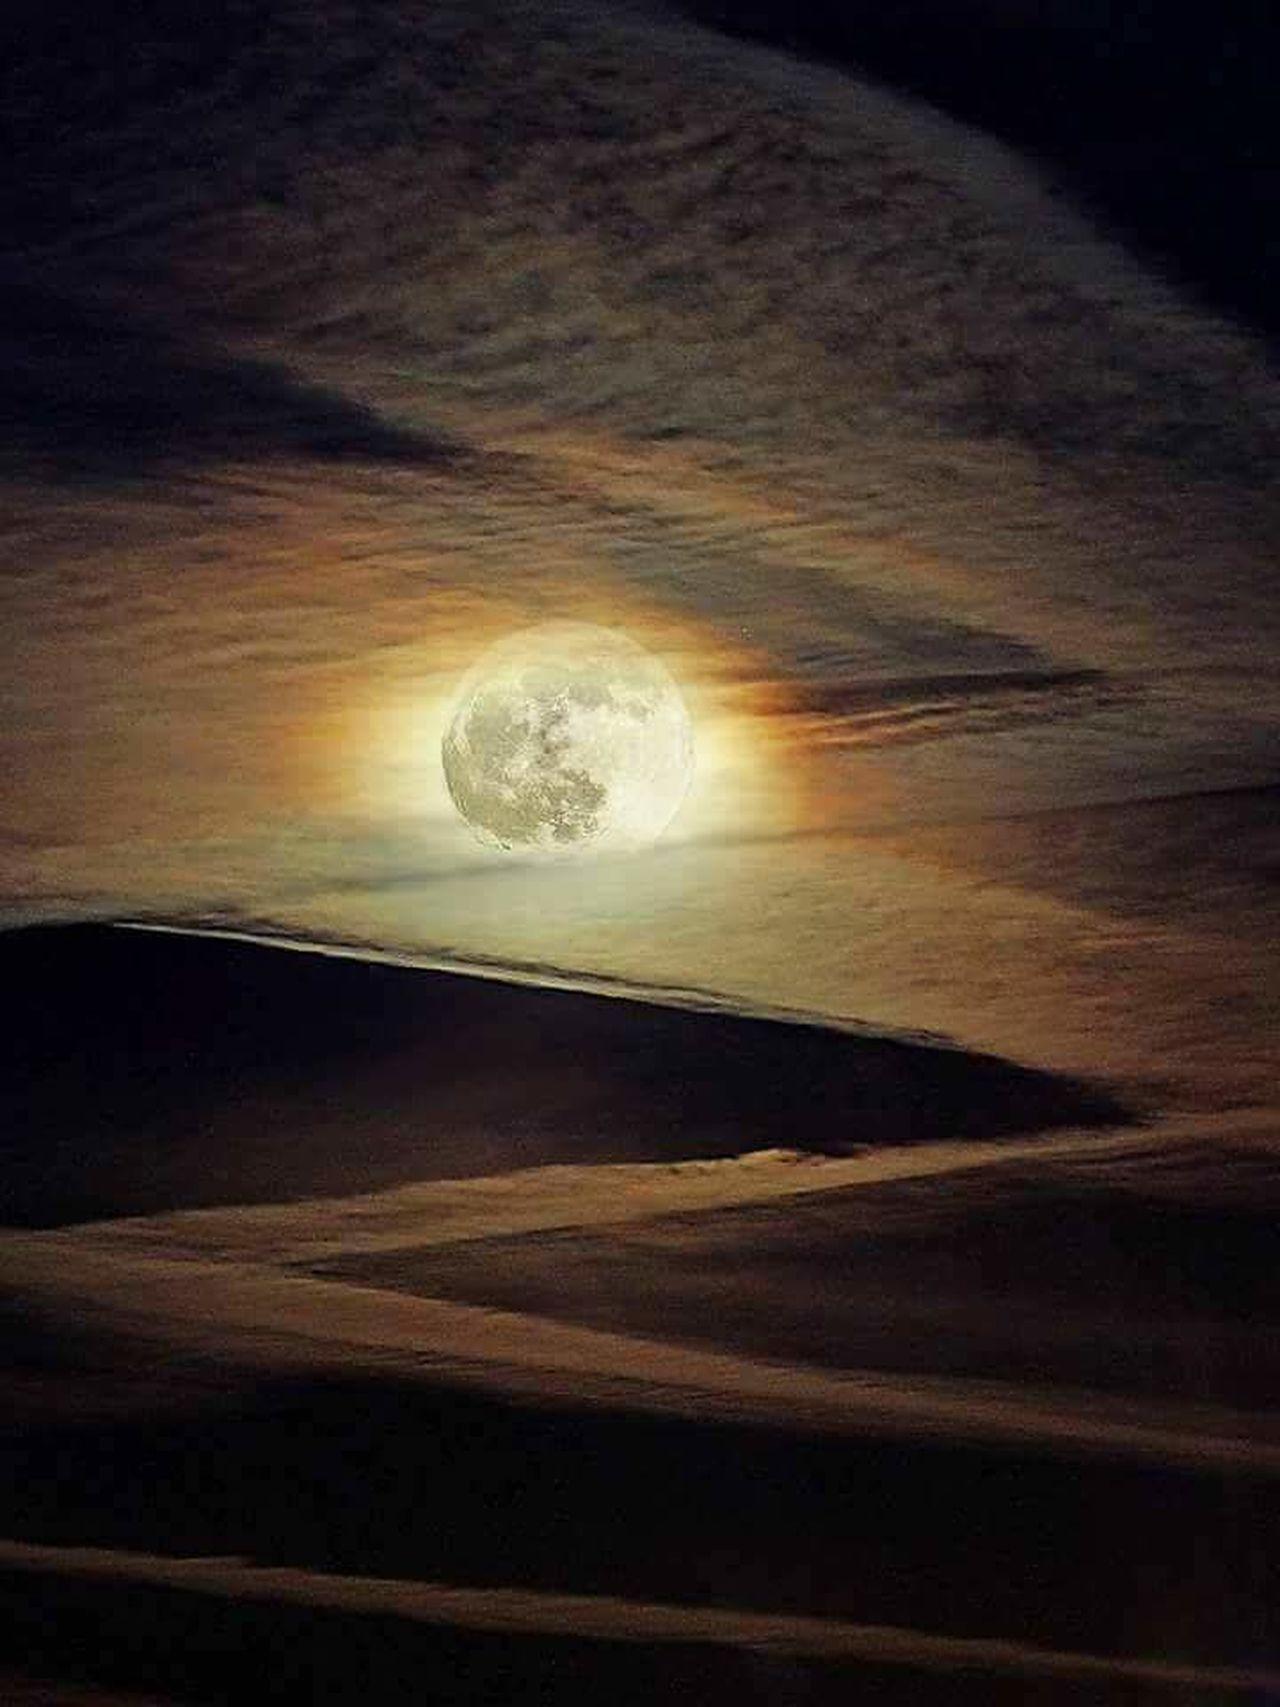 Moon Full Moon Space Night Astronomy Haze Spraying GeoEngineering Whatthefuckaretheyspraying Chemtrails Chemical Sky No Filters Or Effects Aerosols Spraying